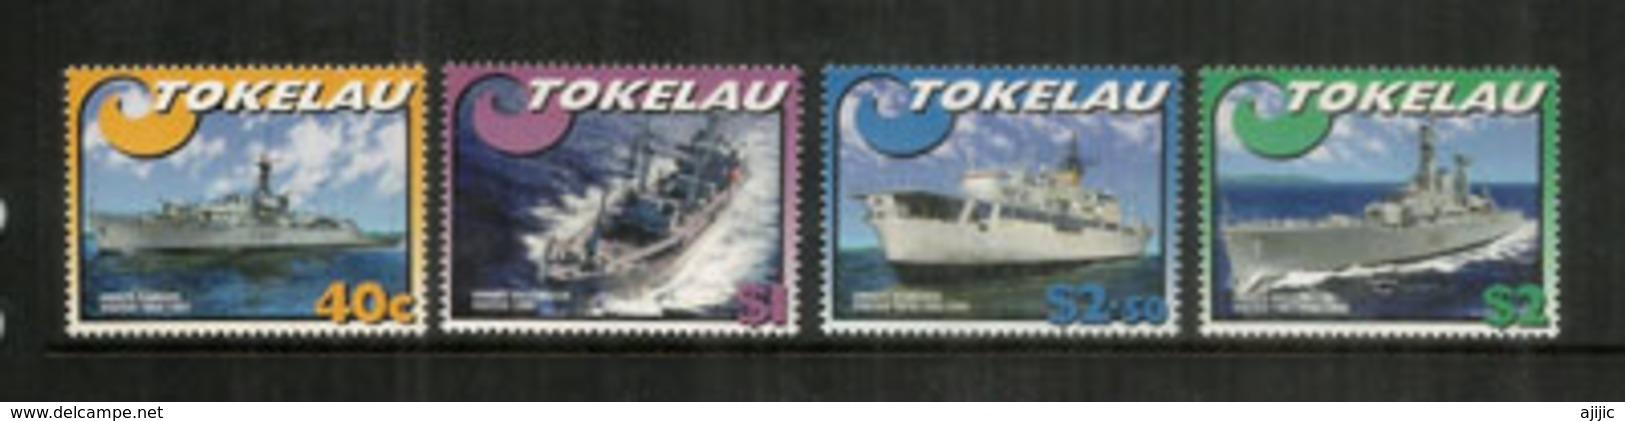 Navires De La New-Zealand Navy.Visit To Tokelau Islands,Tropical Coral Atolls. Océan Pacifique. 4 Timbres Neufs ** 2002 - Tokelau